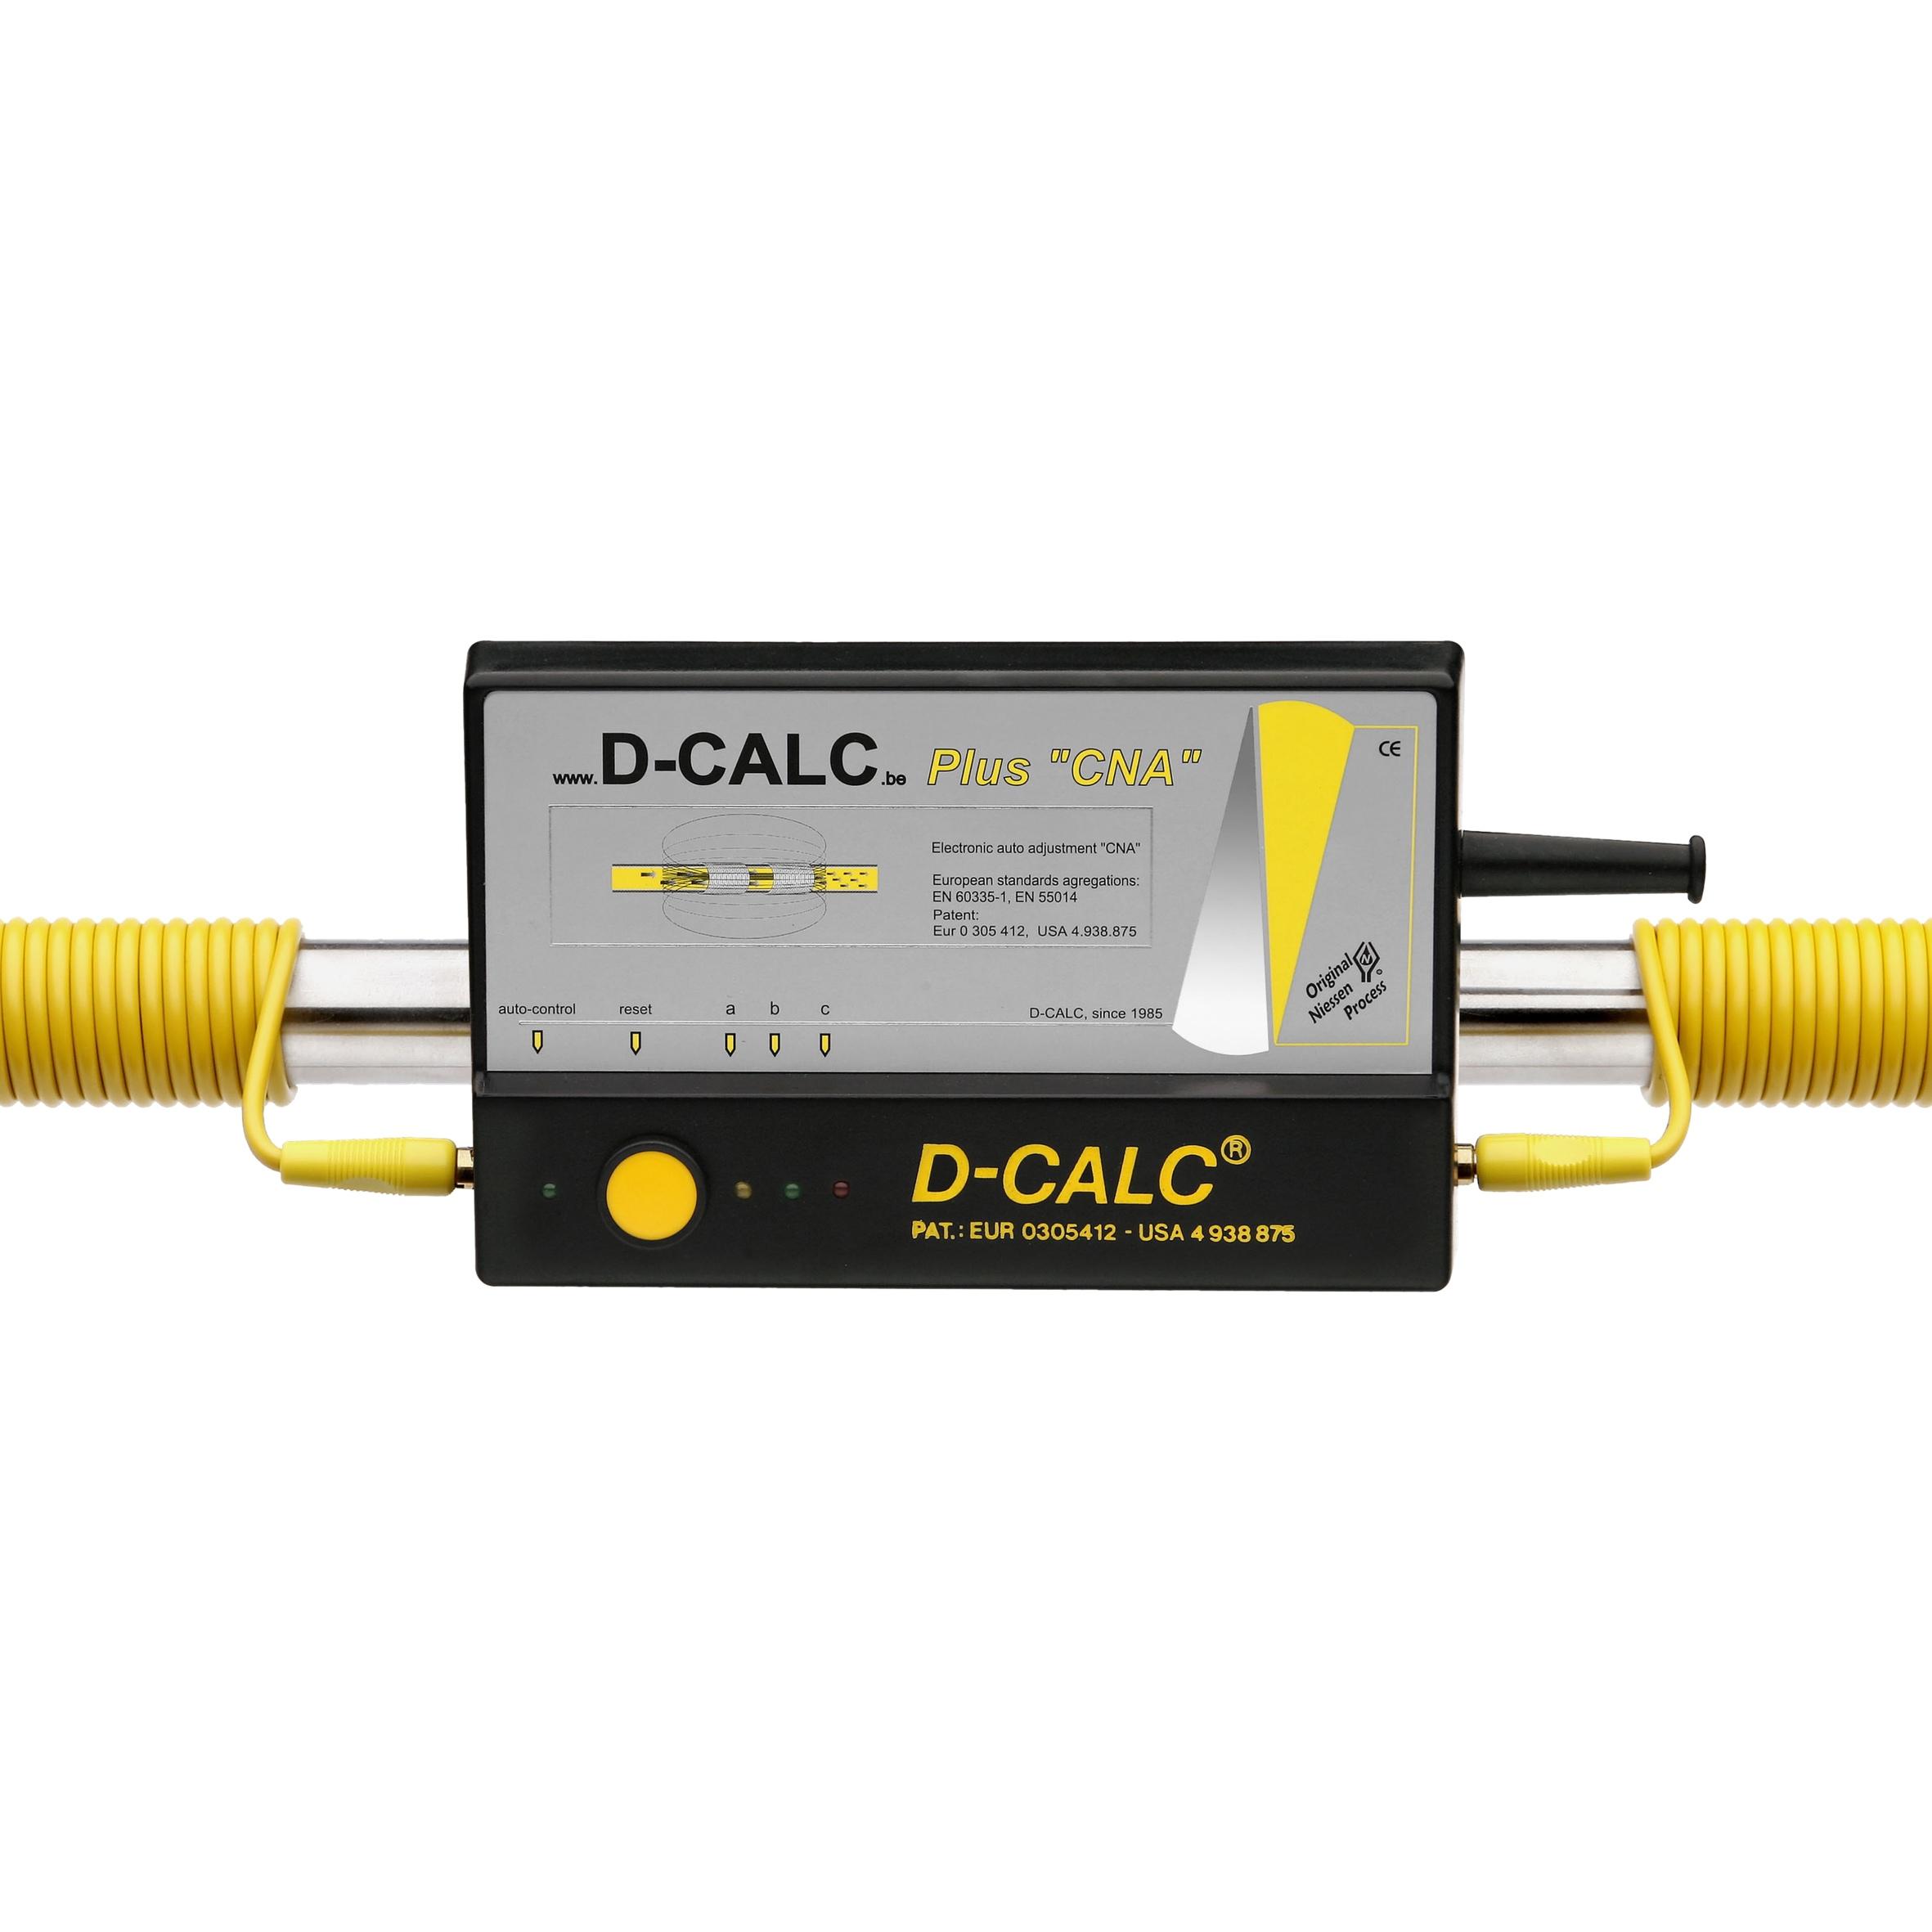 D-CALC%20PLUS%20CNA-carr%C3%A9%20copie.jpg